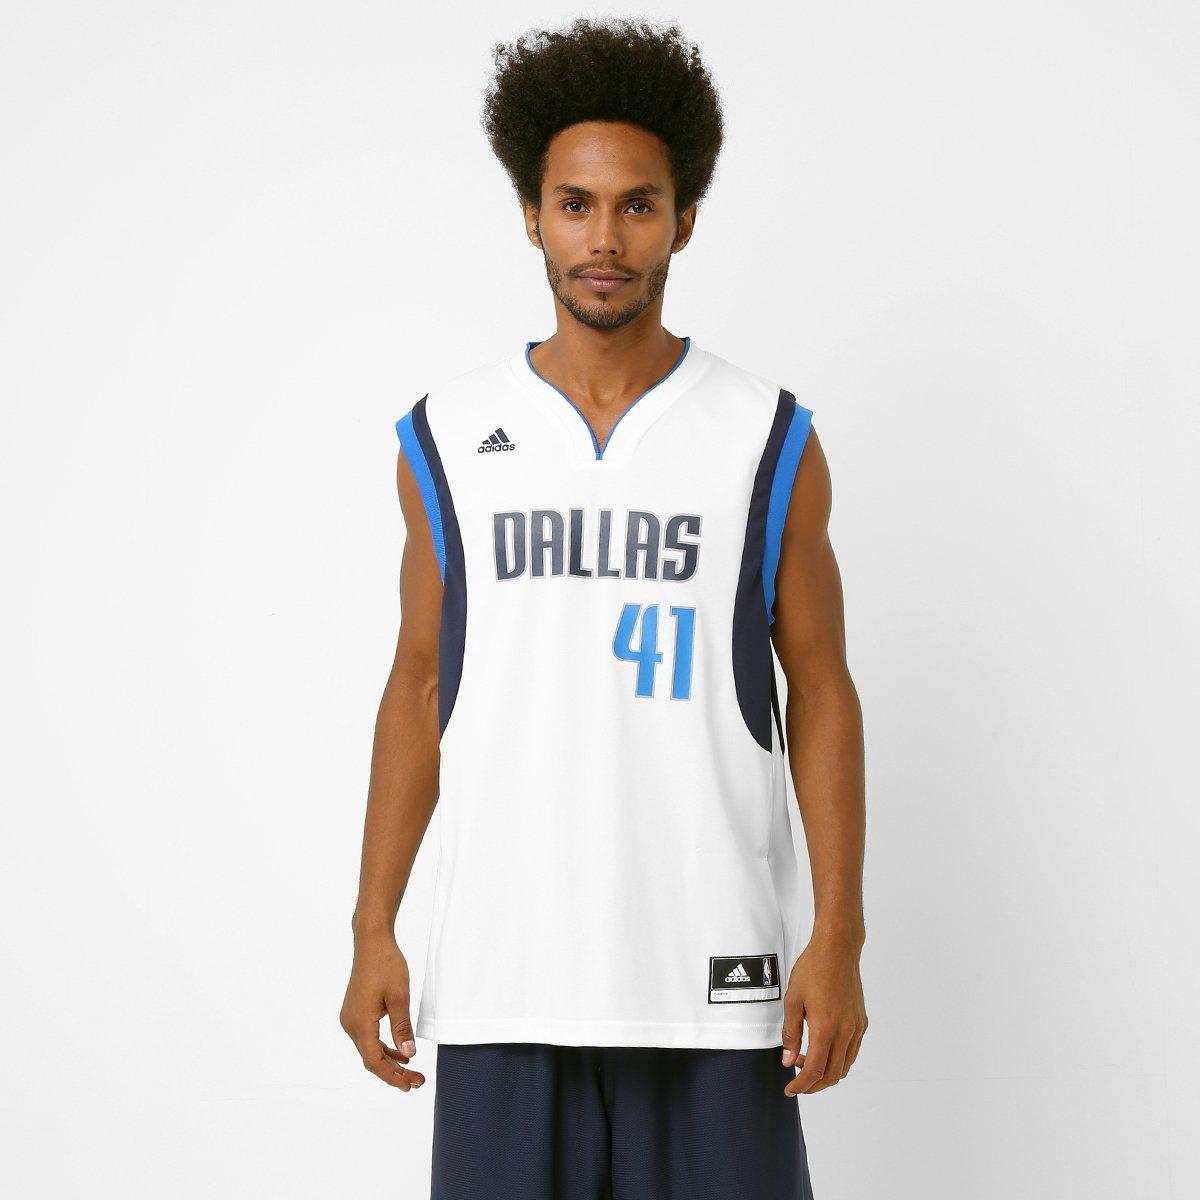 Camiseta Regata Adidas NBA Dallas Mavericks - Nowitzki - Compre Agora  ded88ab4efa2b